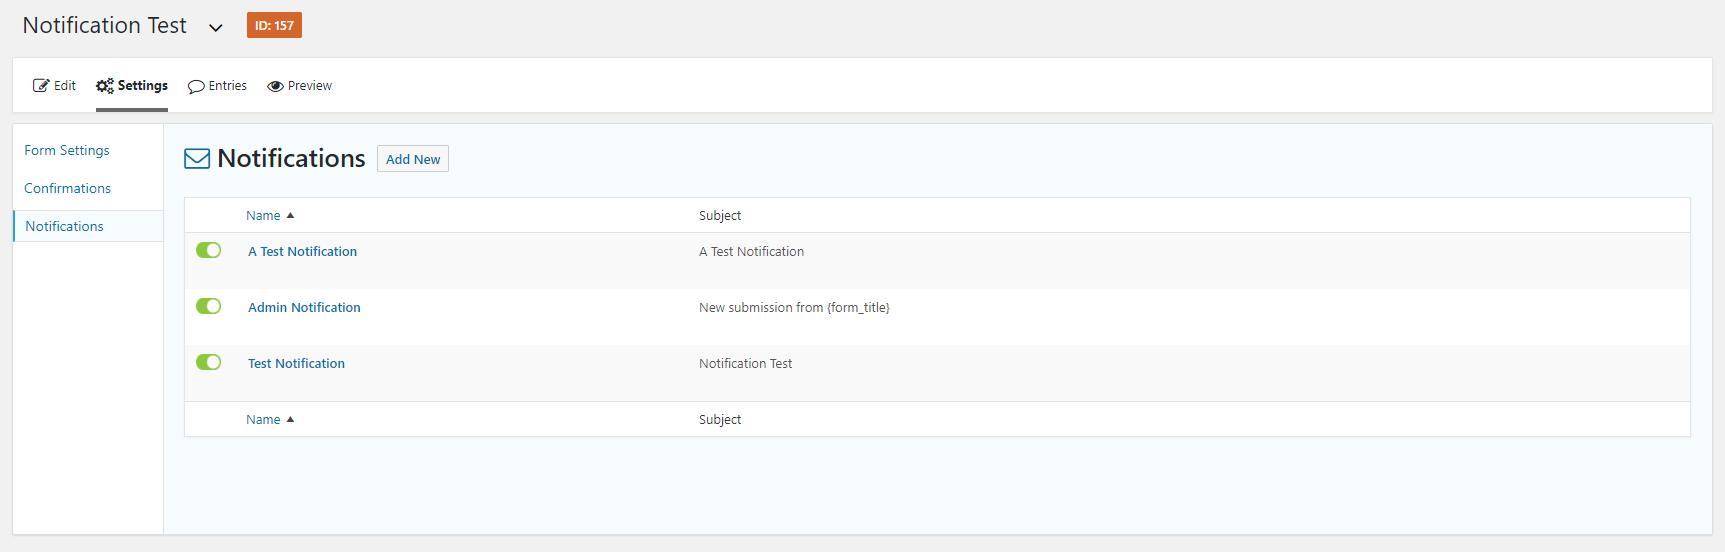 gravityforms notification list